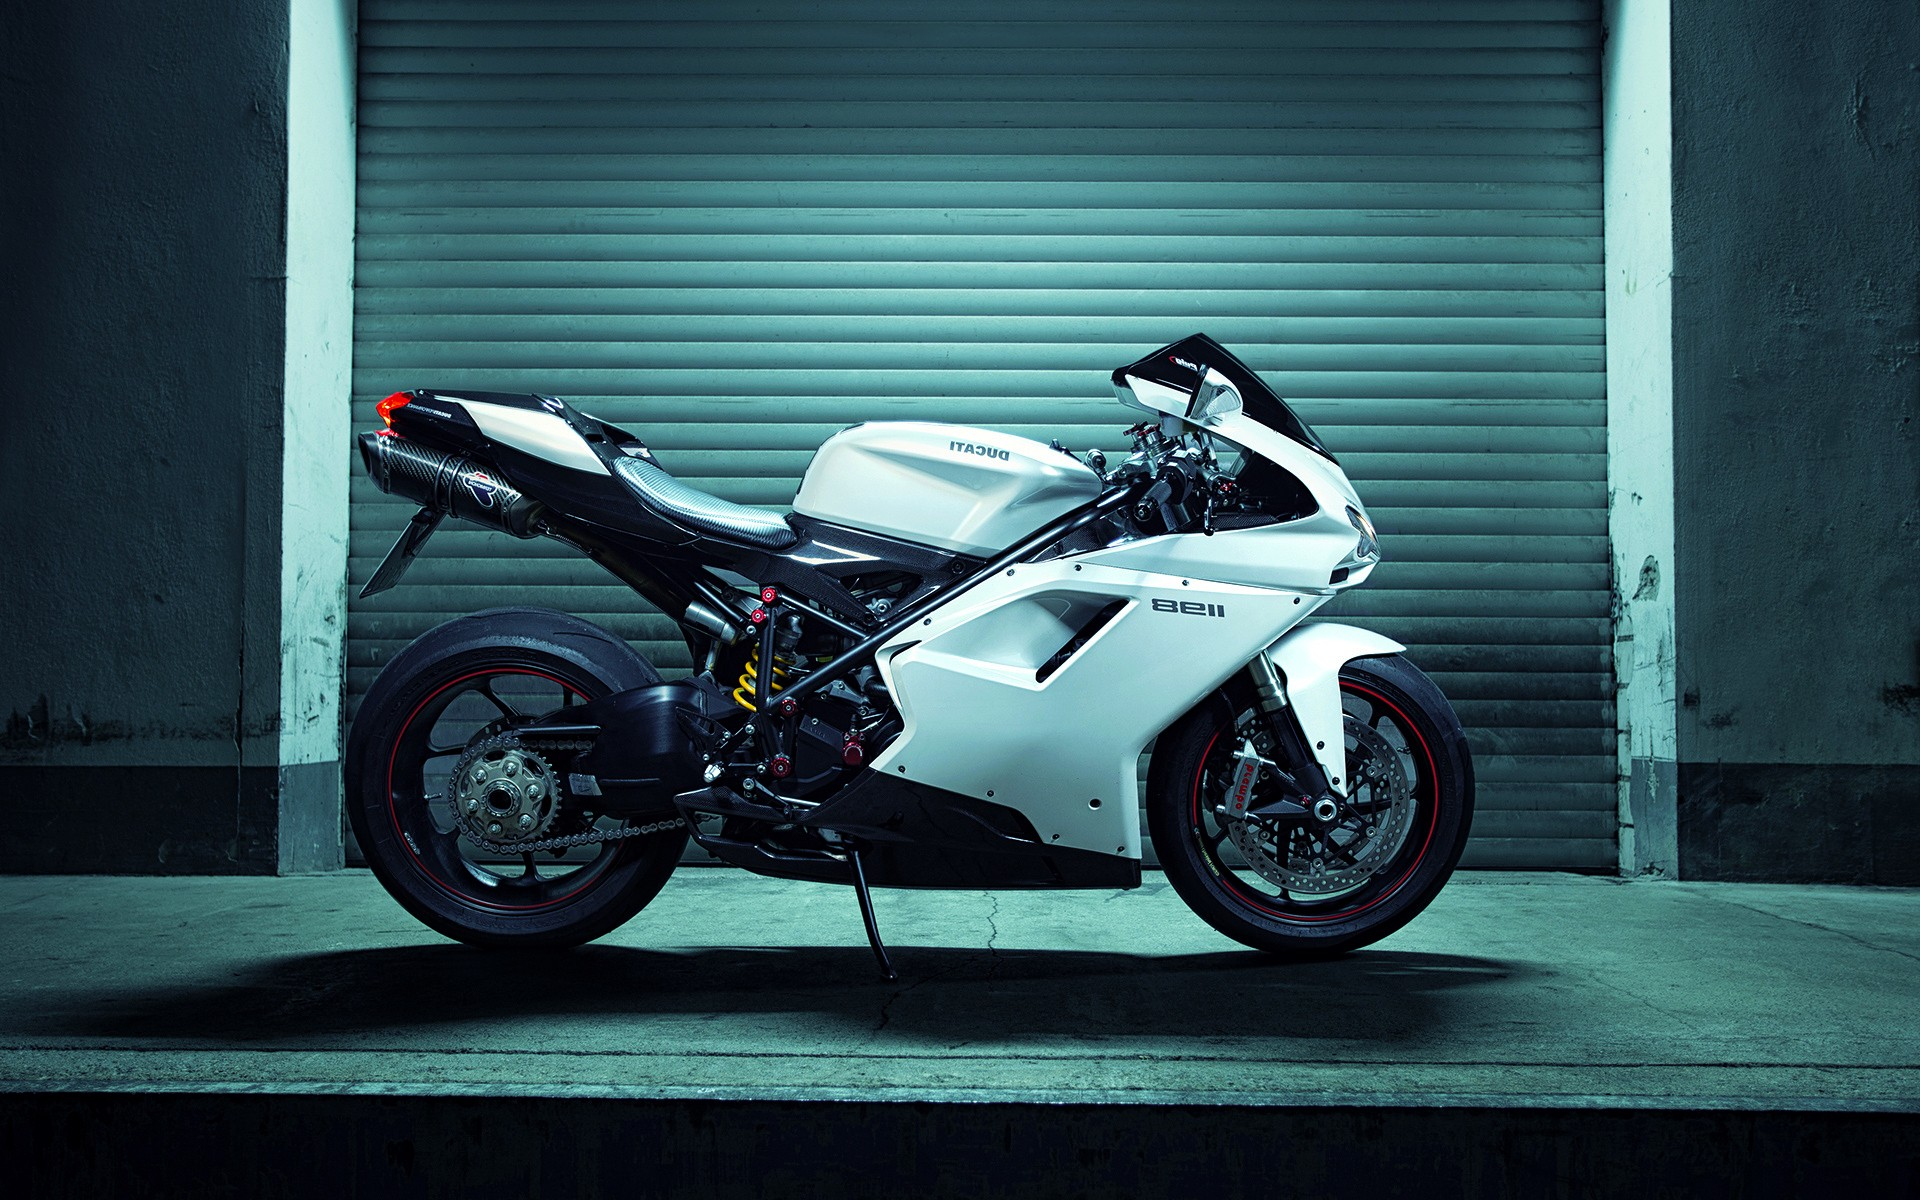 ducati 1198 | bikes hd 4k wallpapers